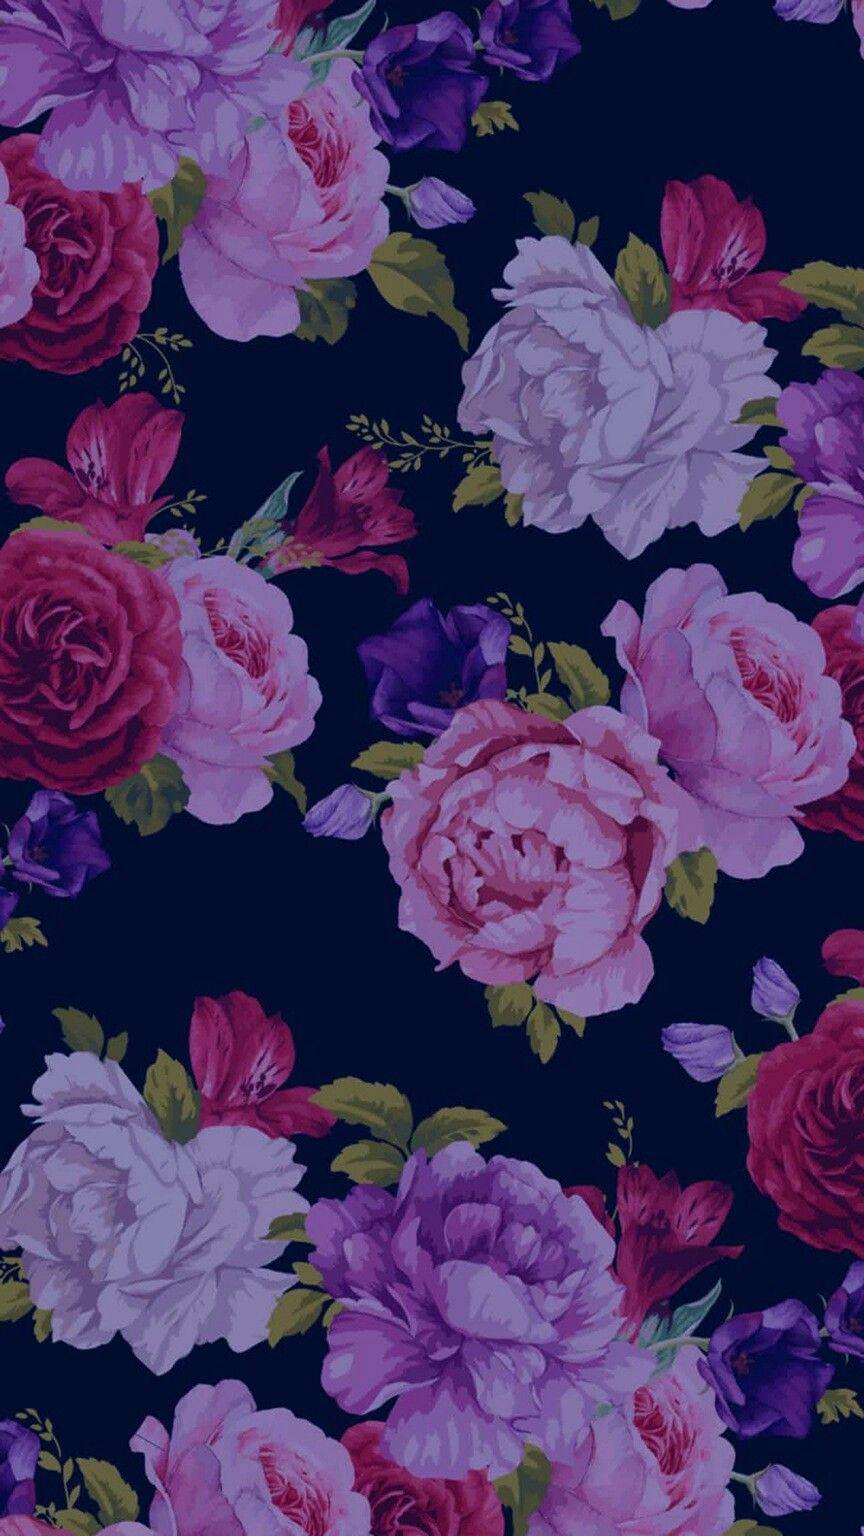 Pin By Ela97 On Dlya Mamy Flower Iphone Wallpaper Flowery Wallpaper Flower Wallpaper